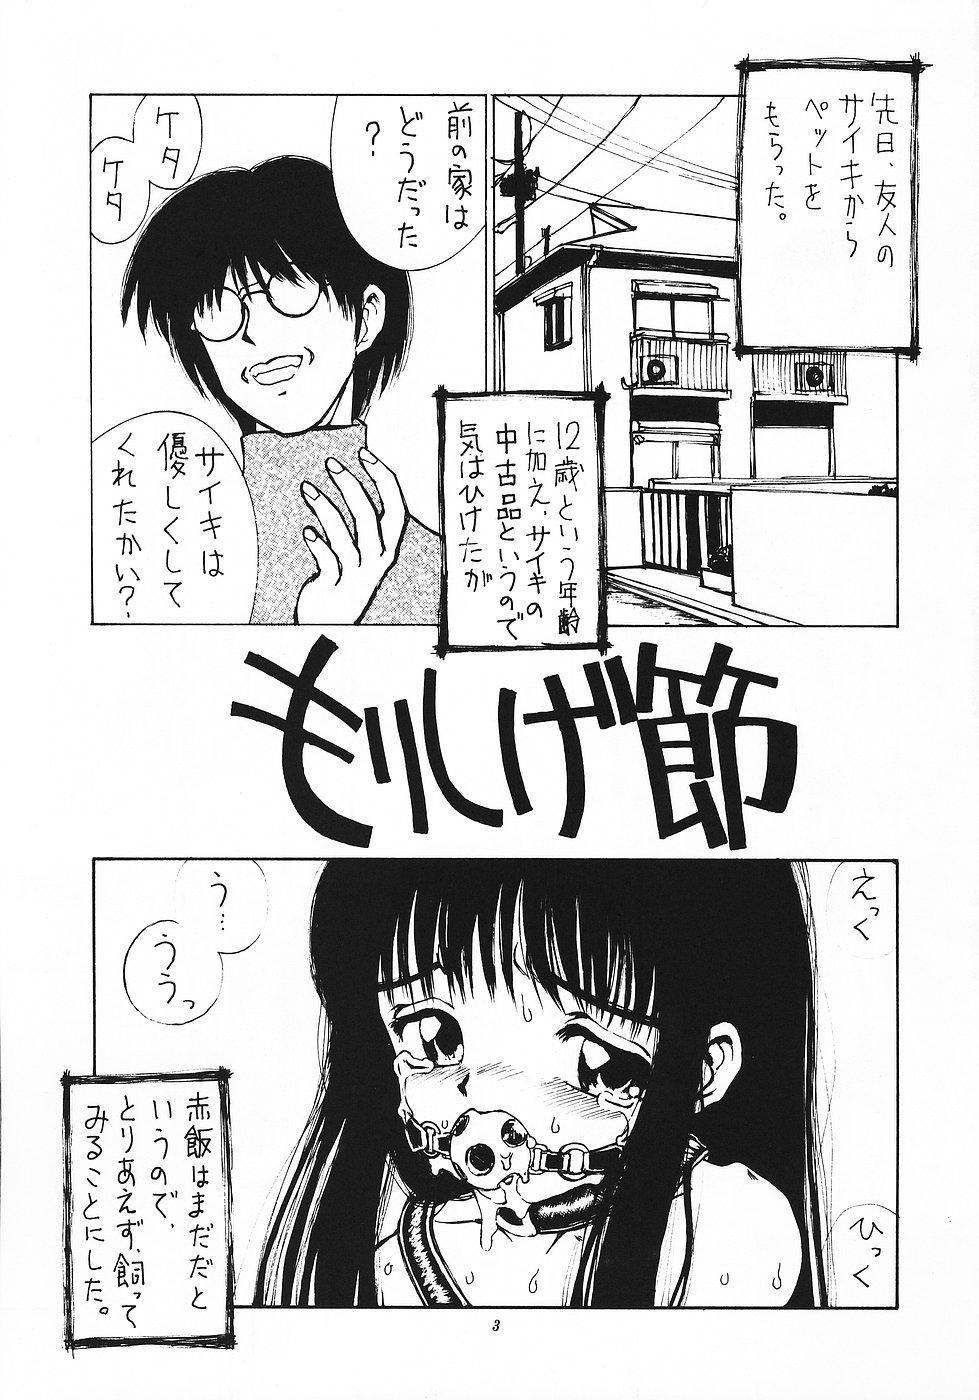 Shikisaiengi 3 1